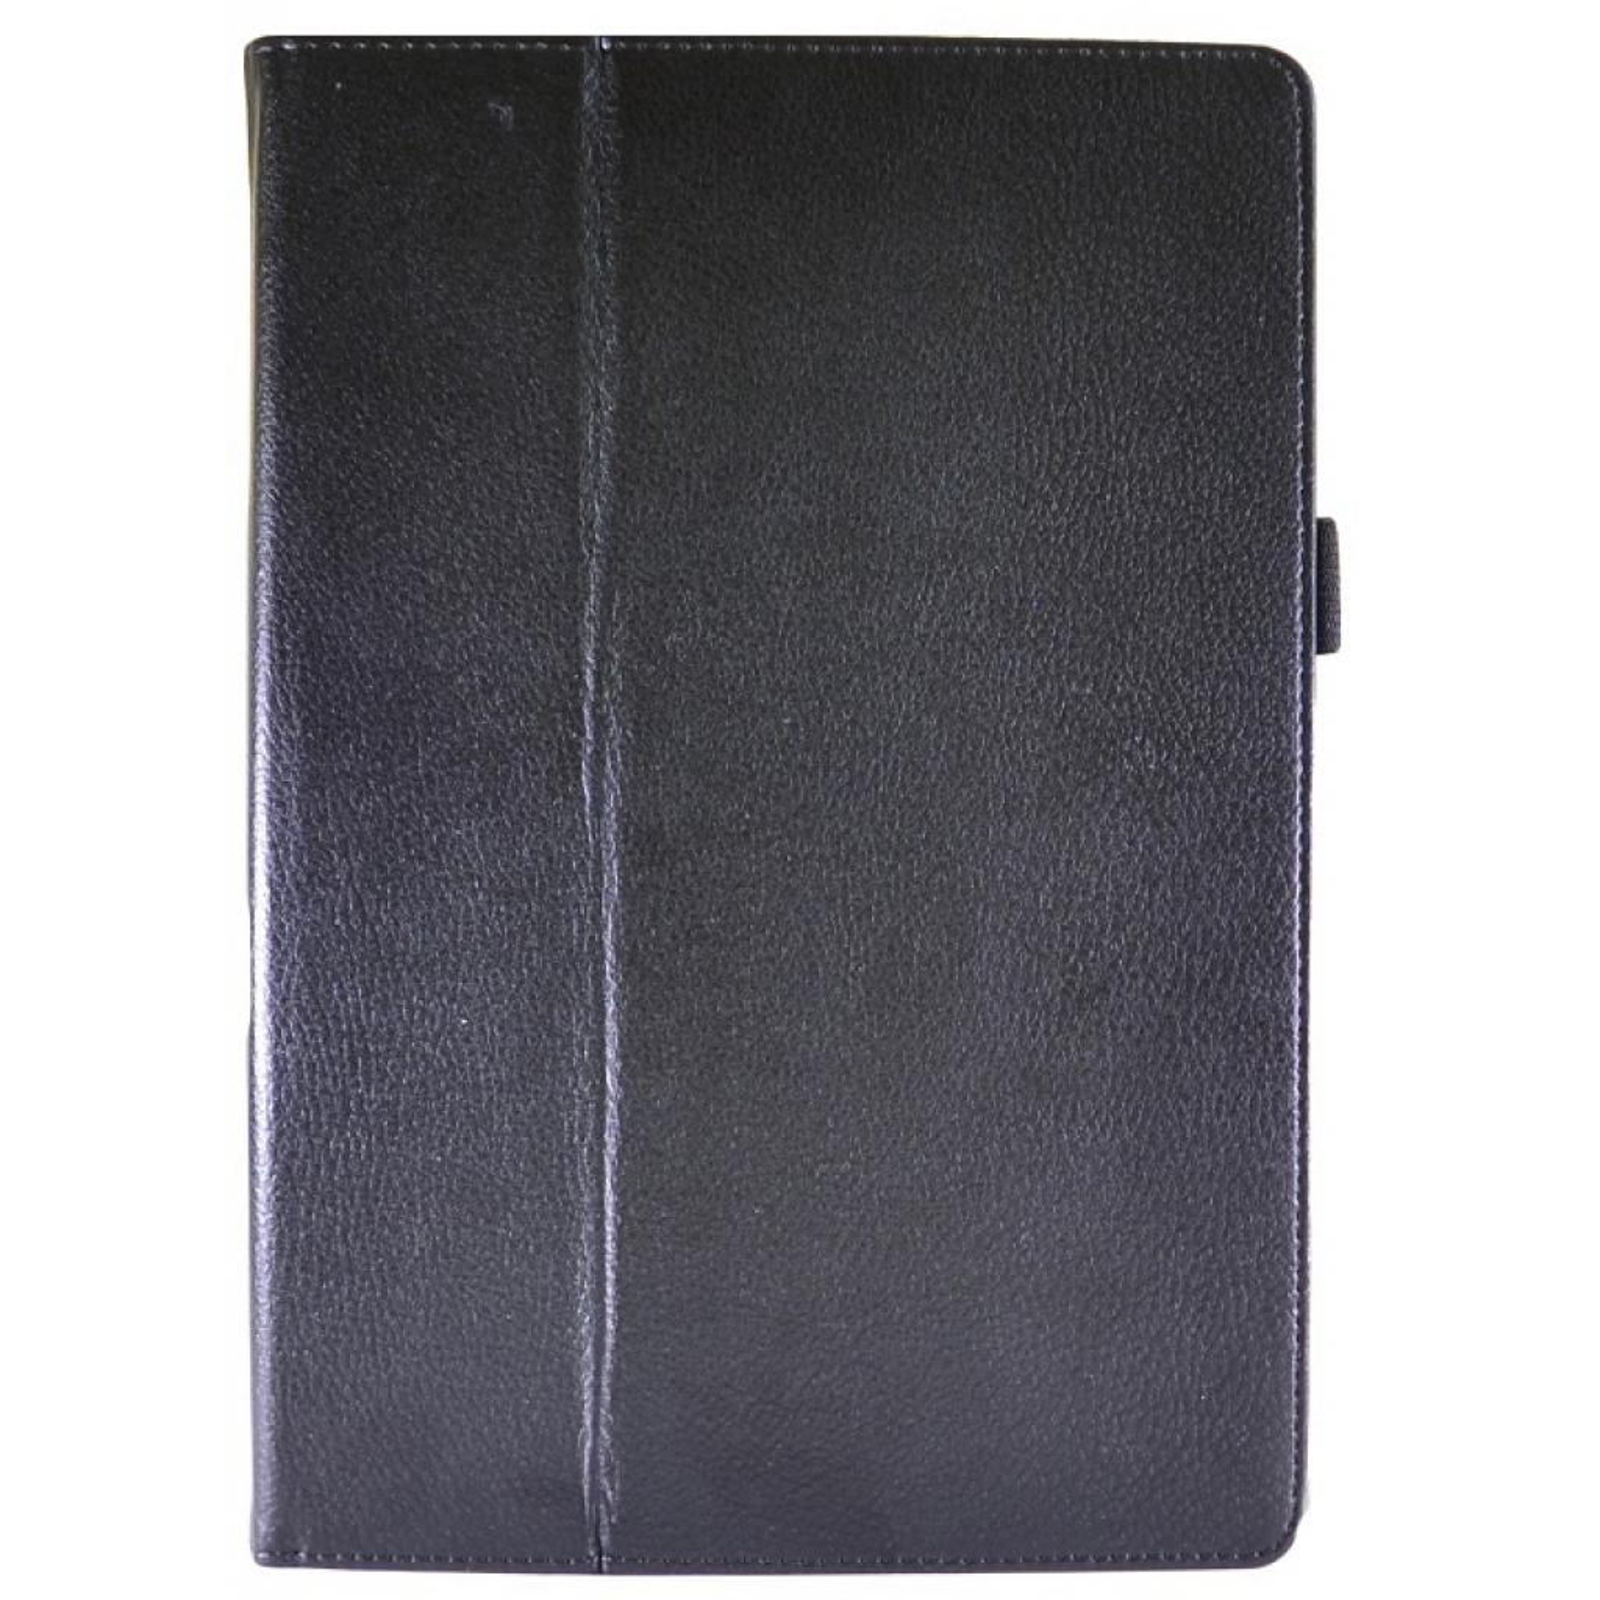 "Чехол для планшета Pro-case 10"" ASUS ME302 (ME302 black)"